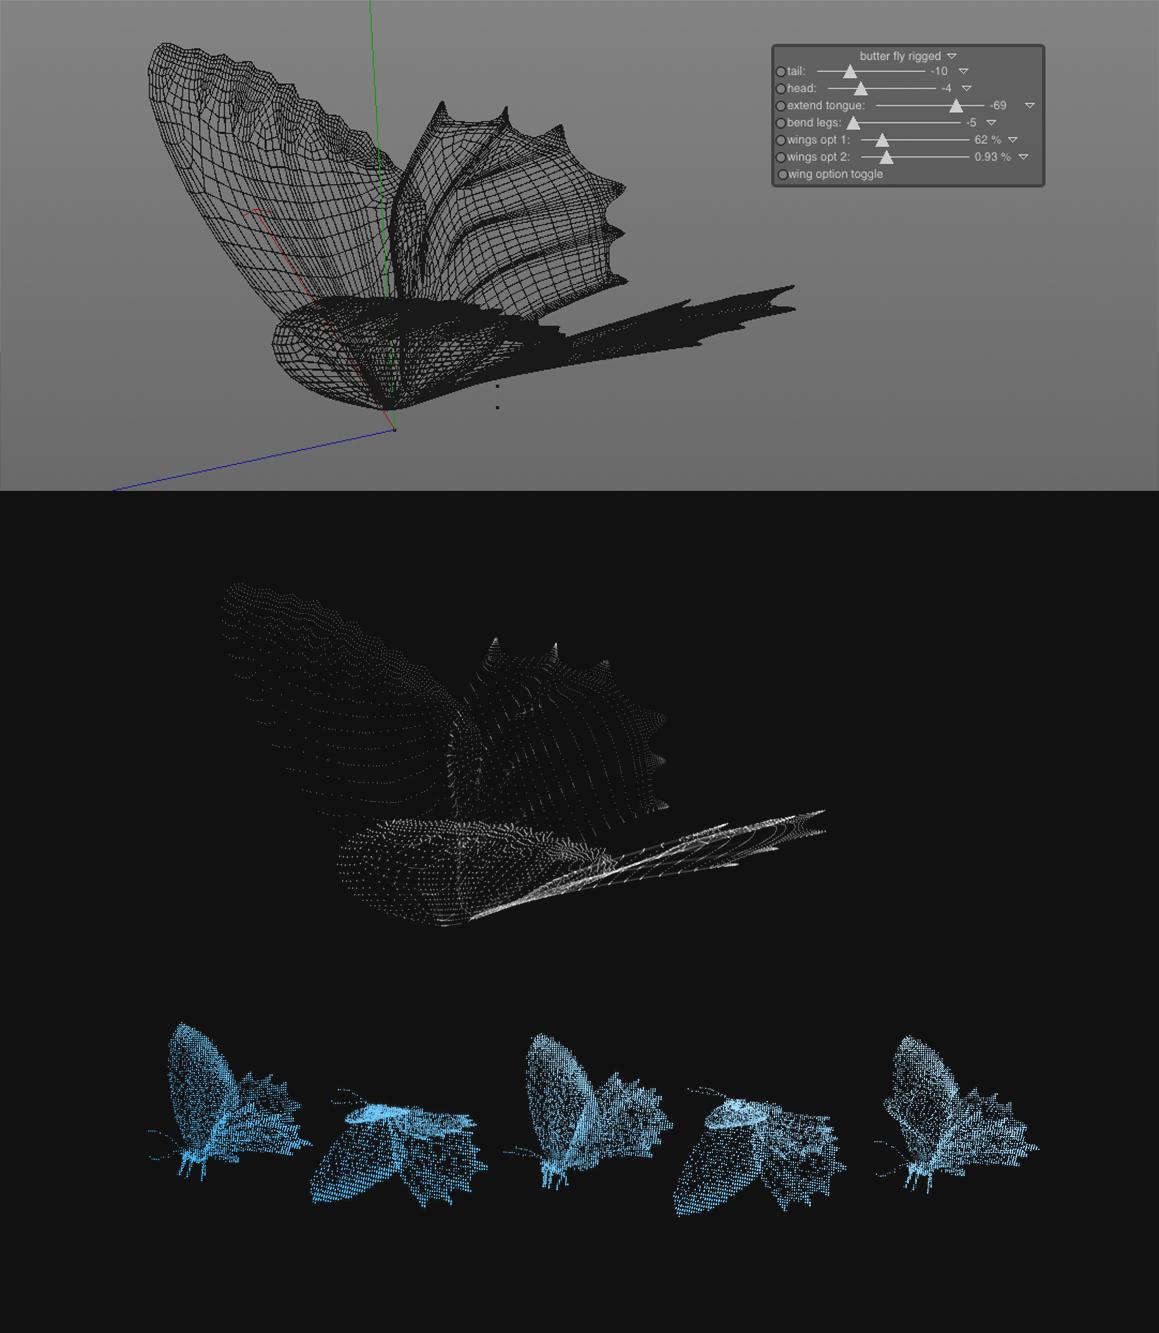 Butterfly-Hologram